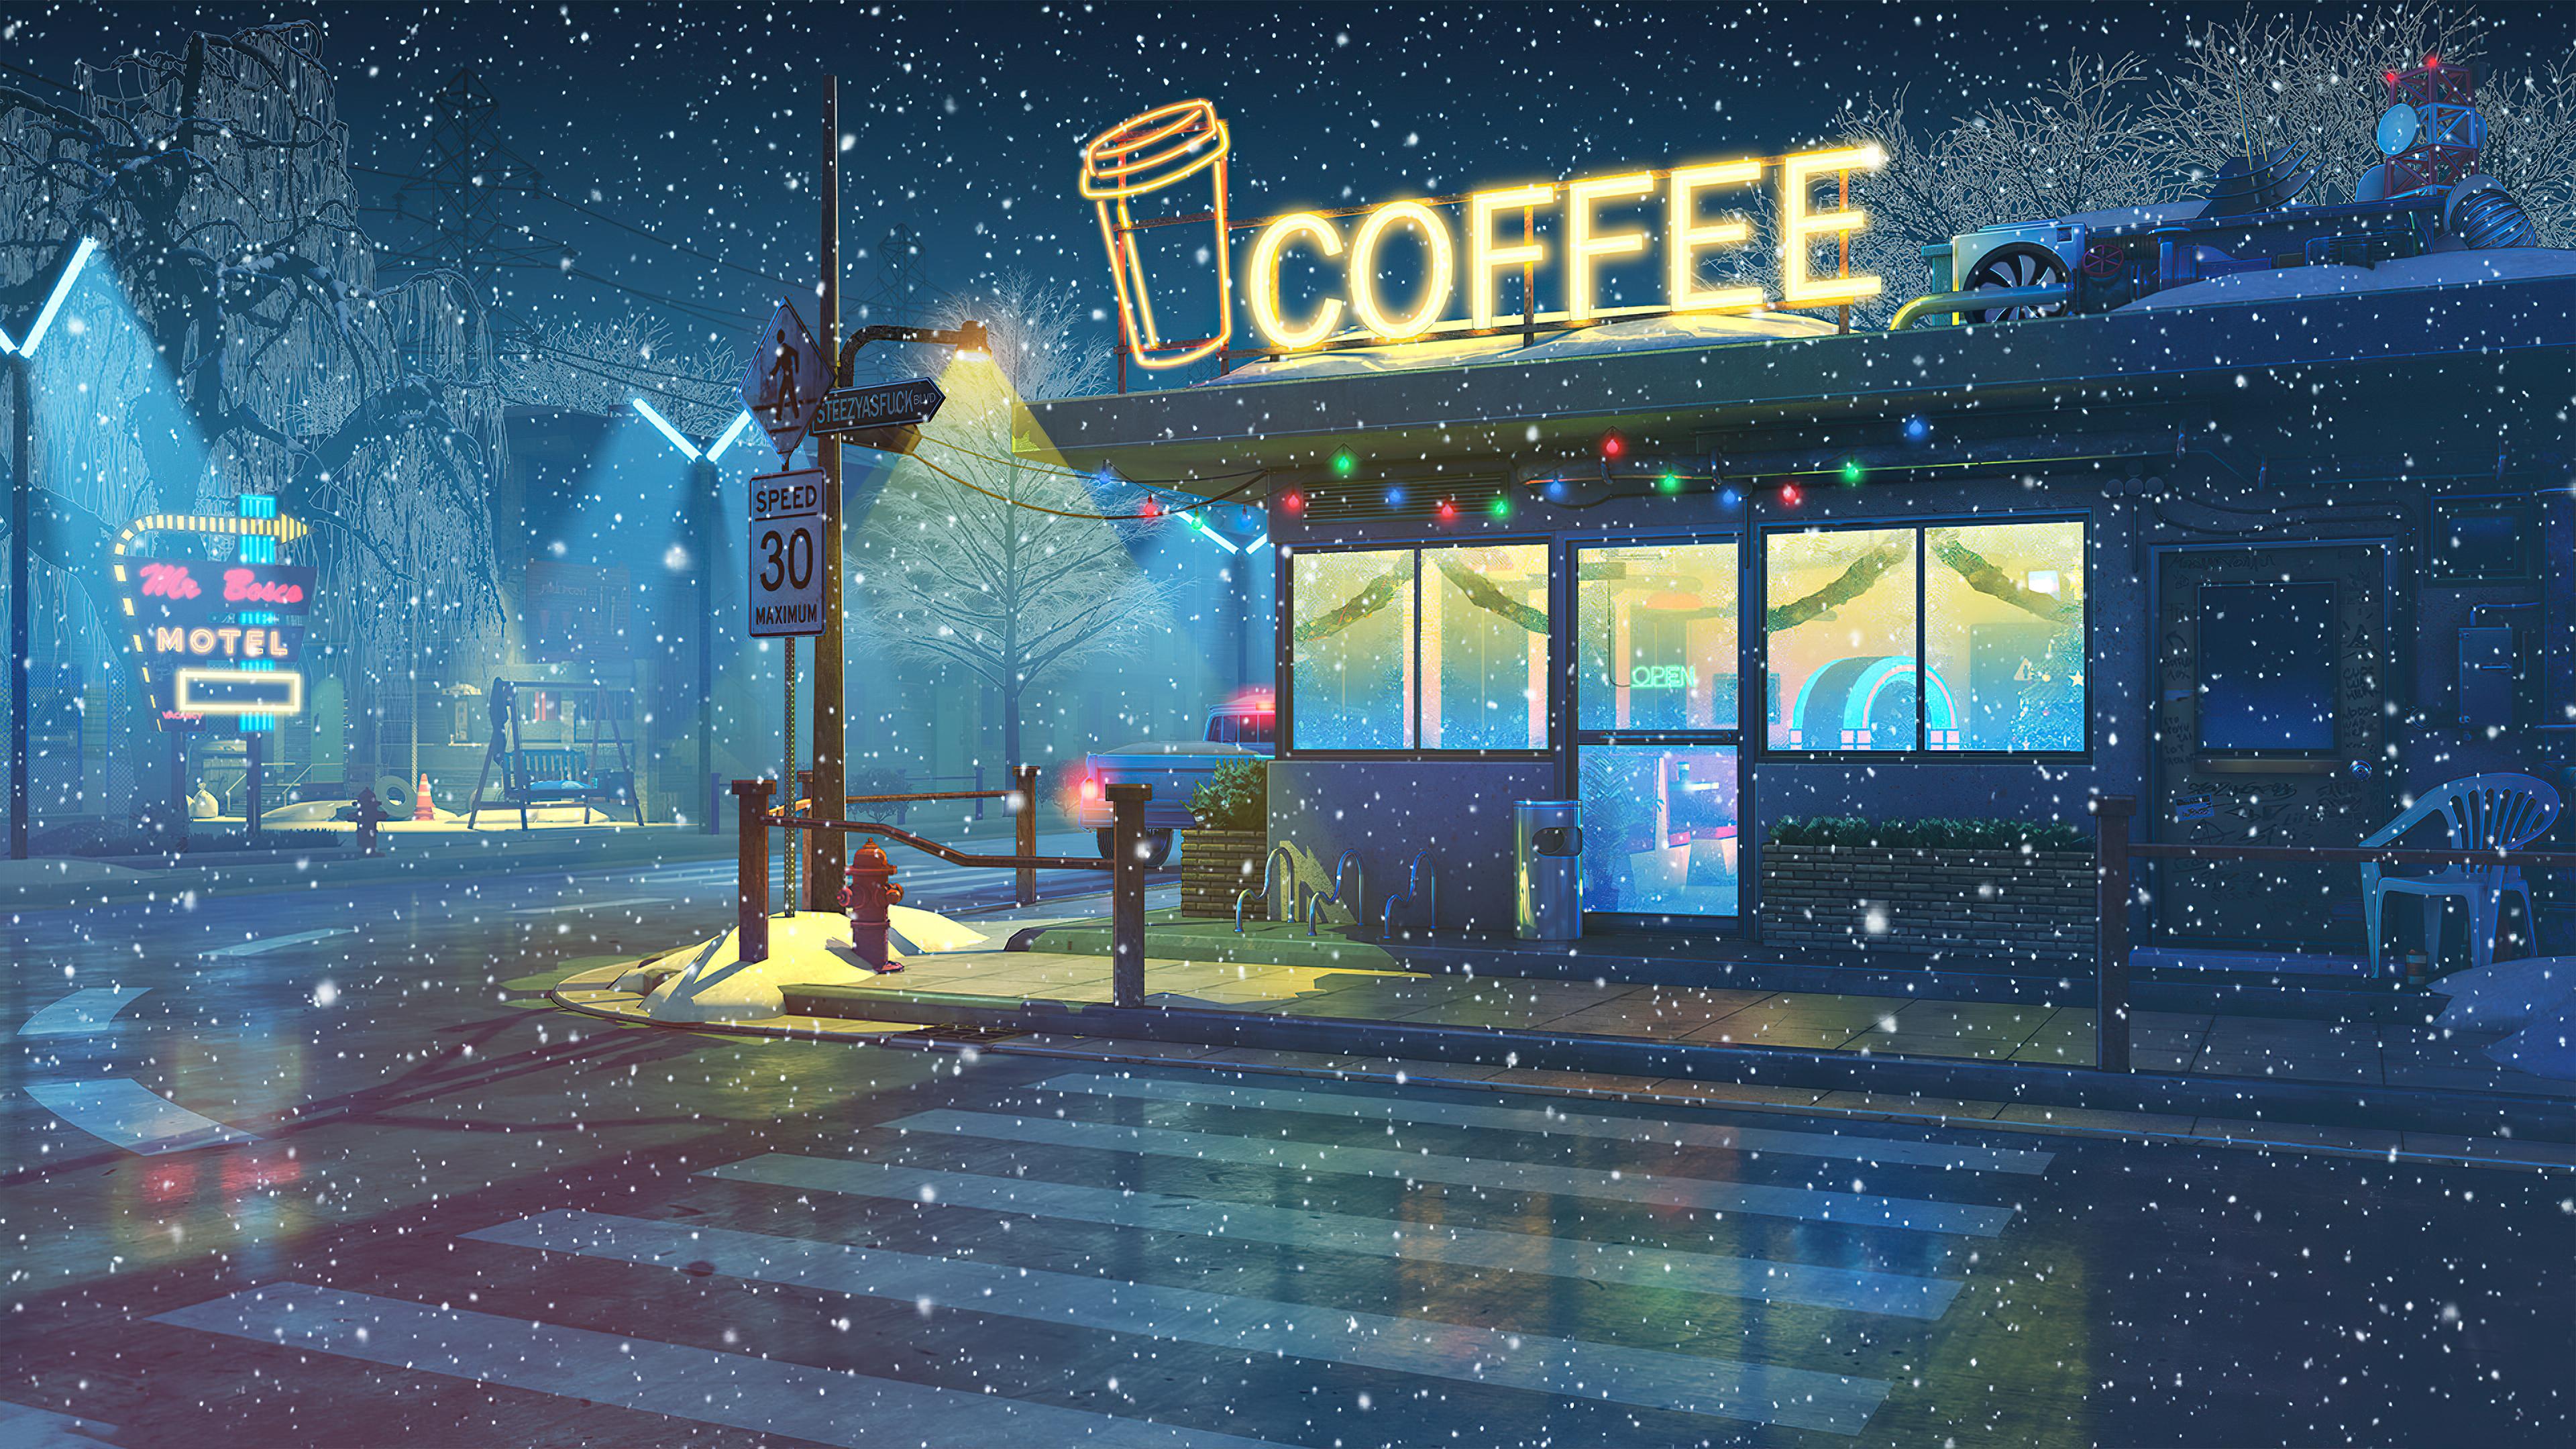 lo fi cafe 4k 1608581287 - Lo Fi Cafe 4k - Lo Fi Cafe 4k wallpapers